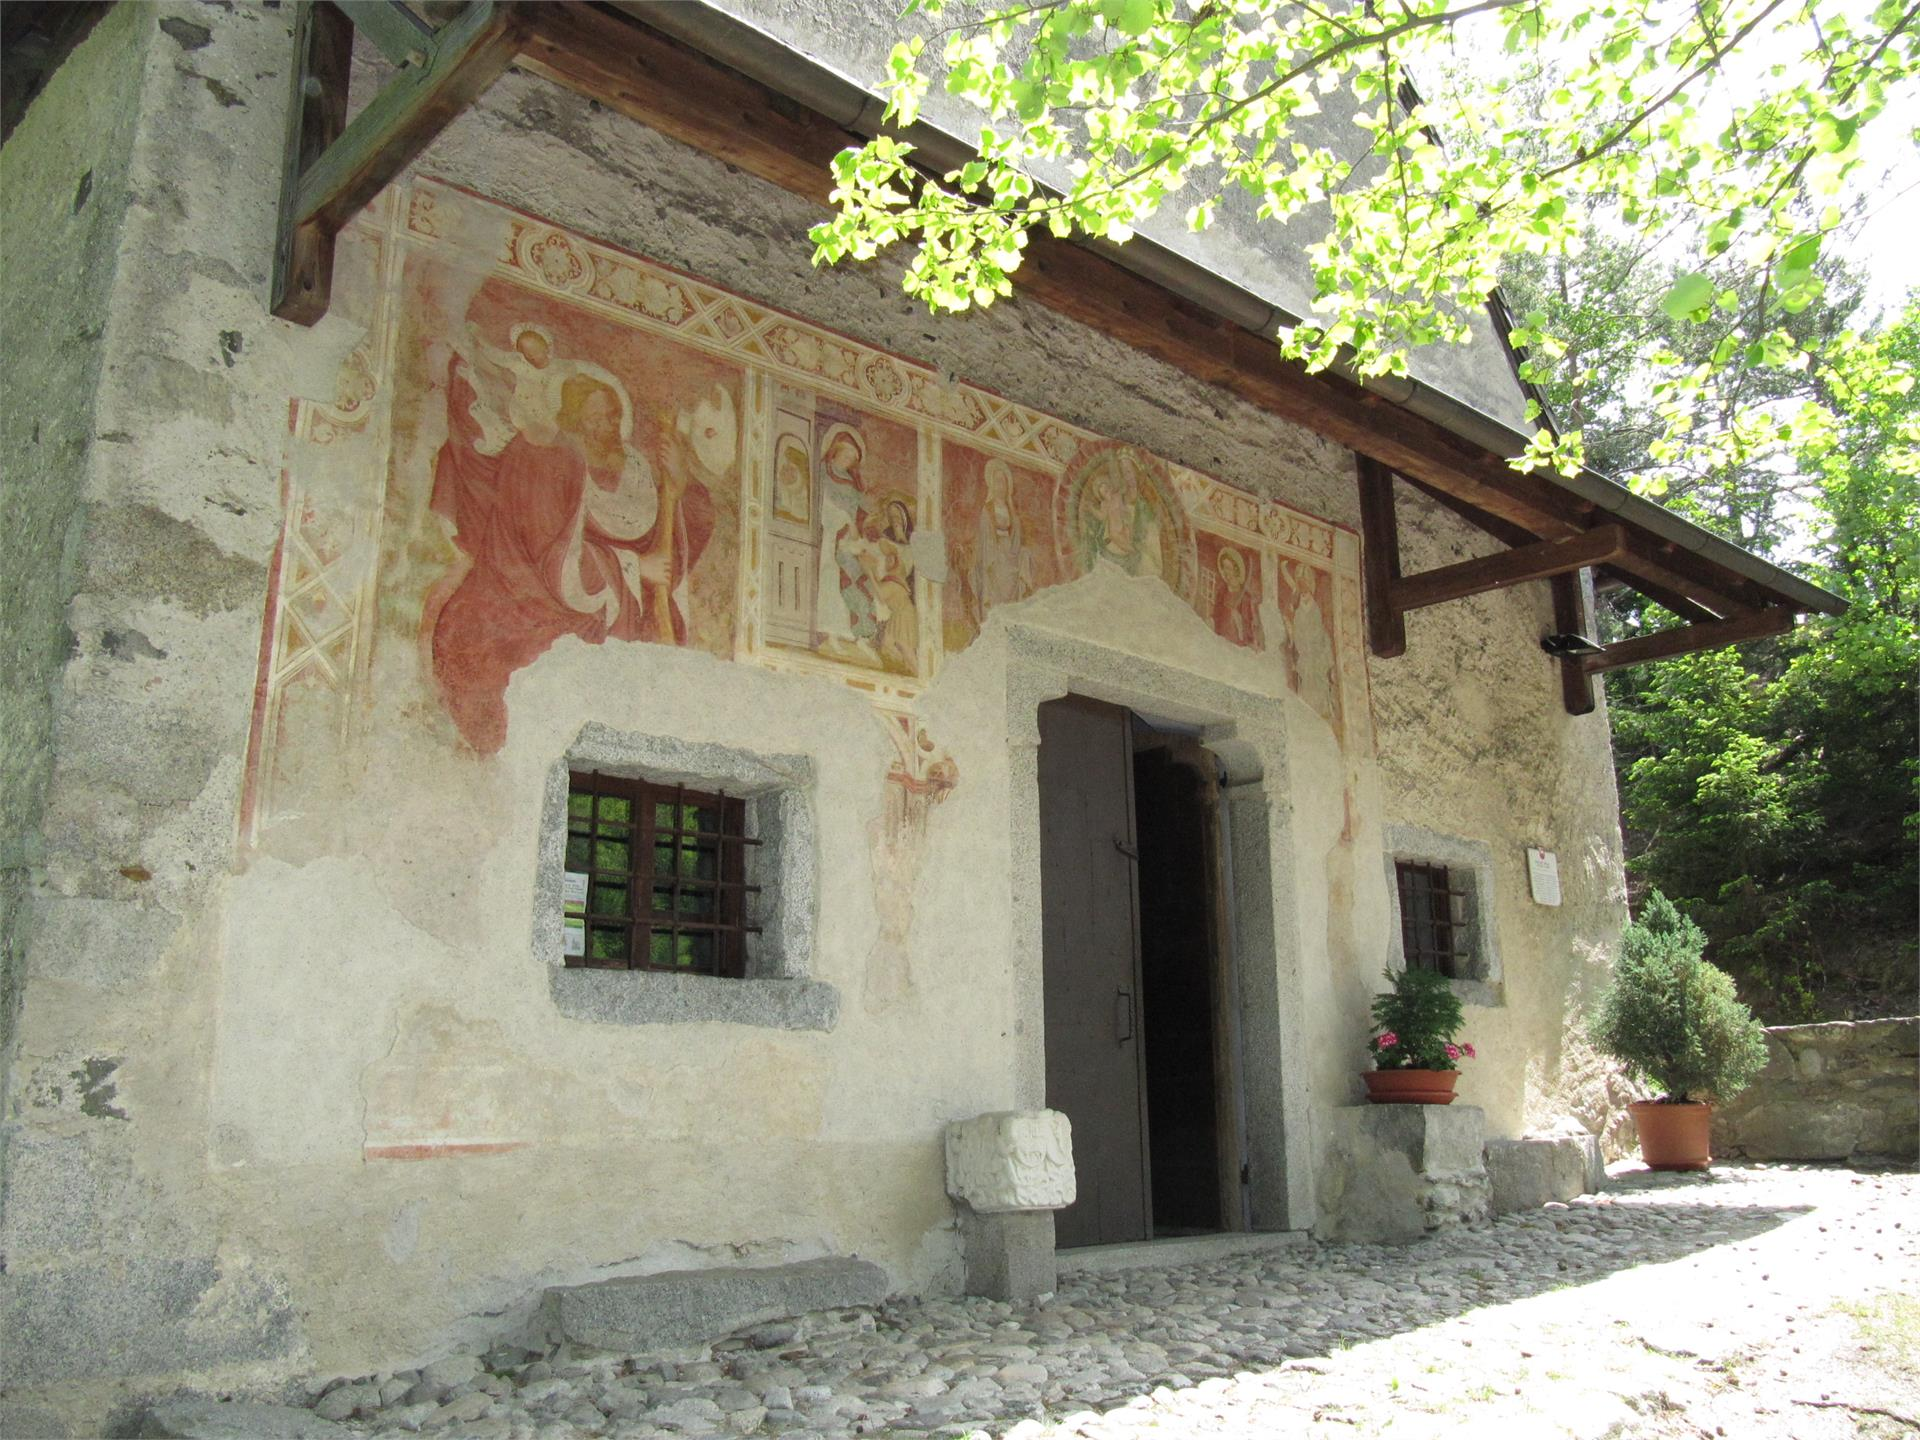 St. Cyrillus path